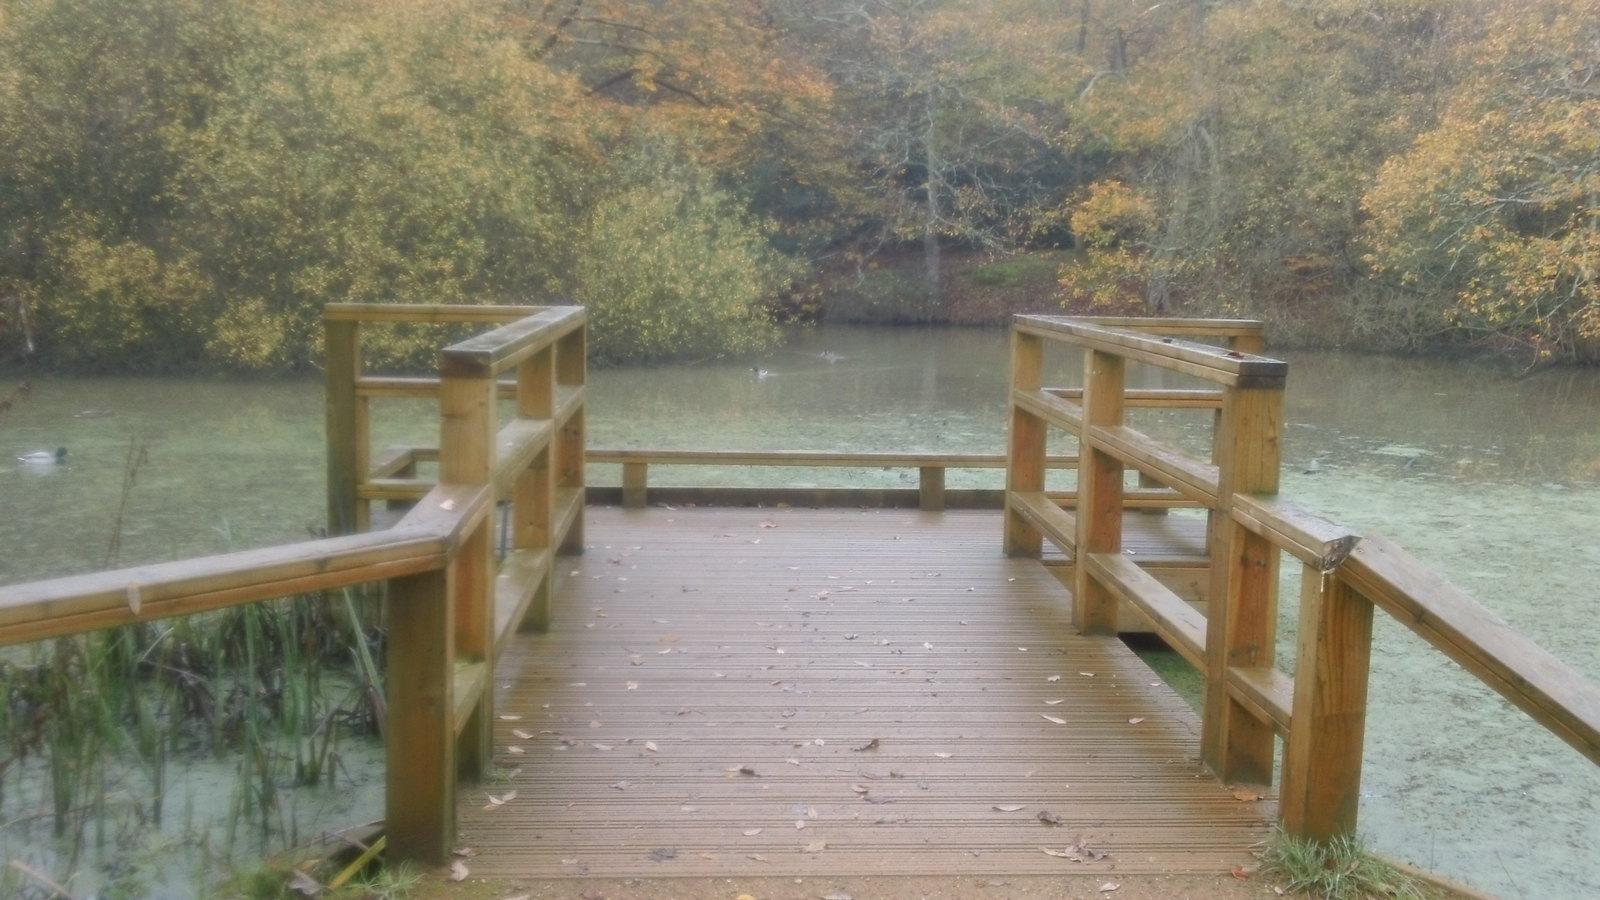 Duckboard Epping Forest